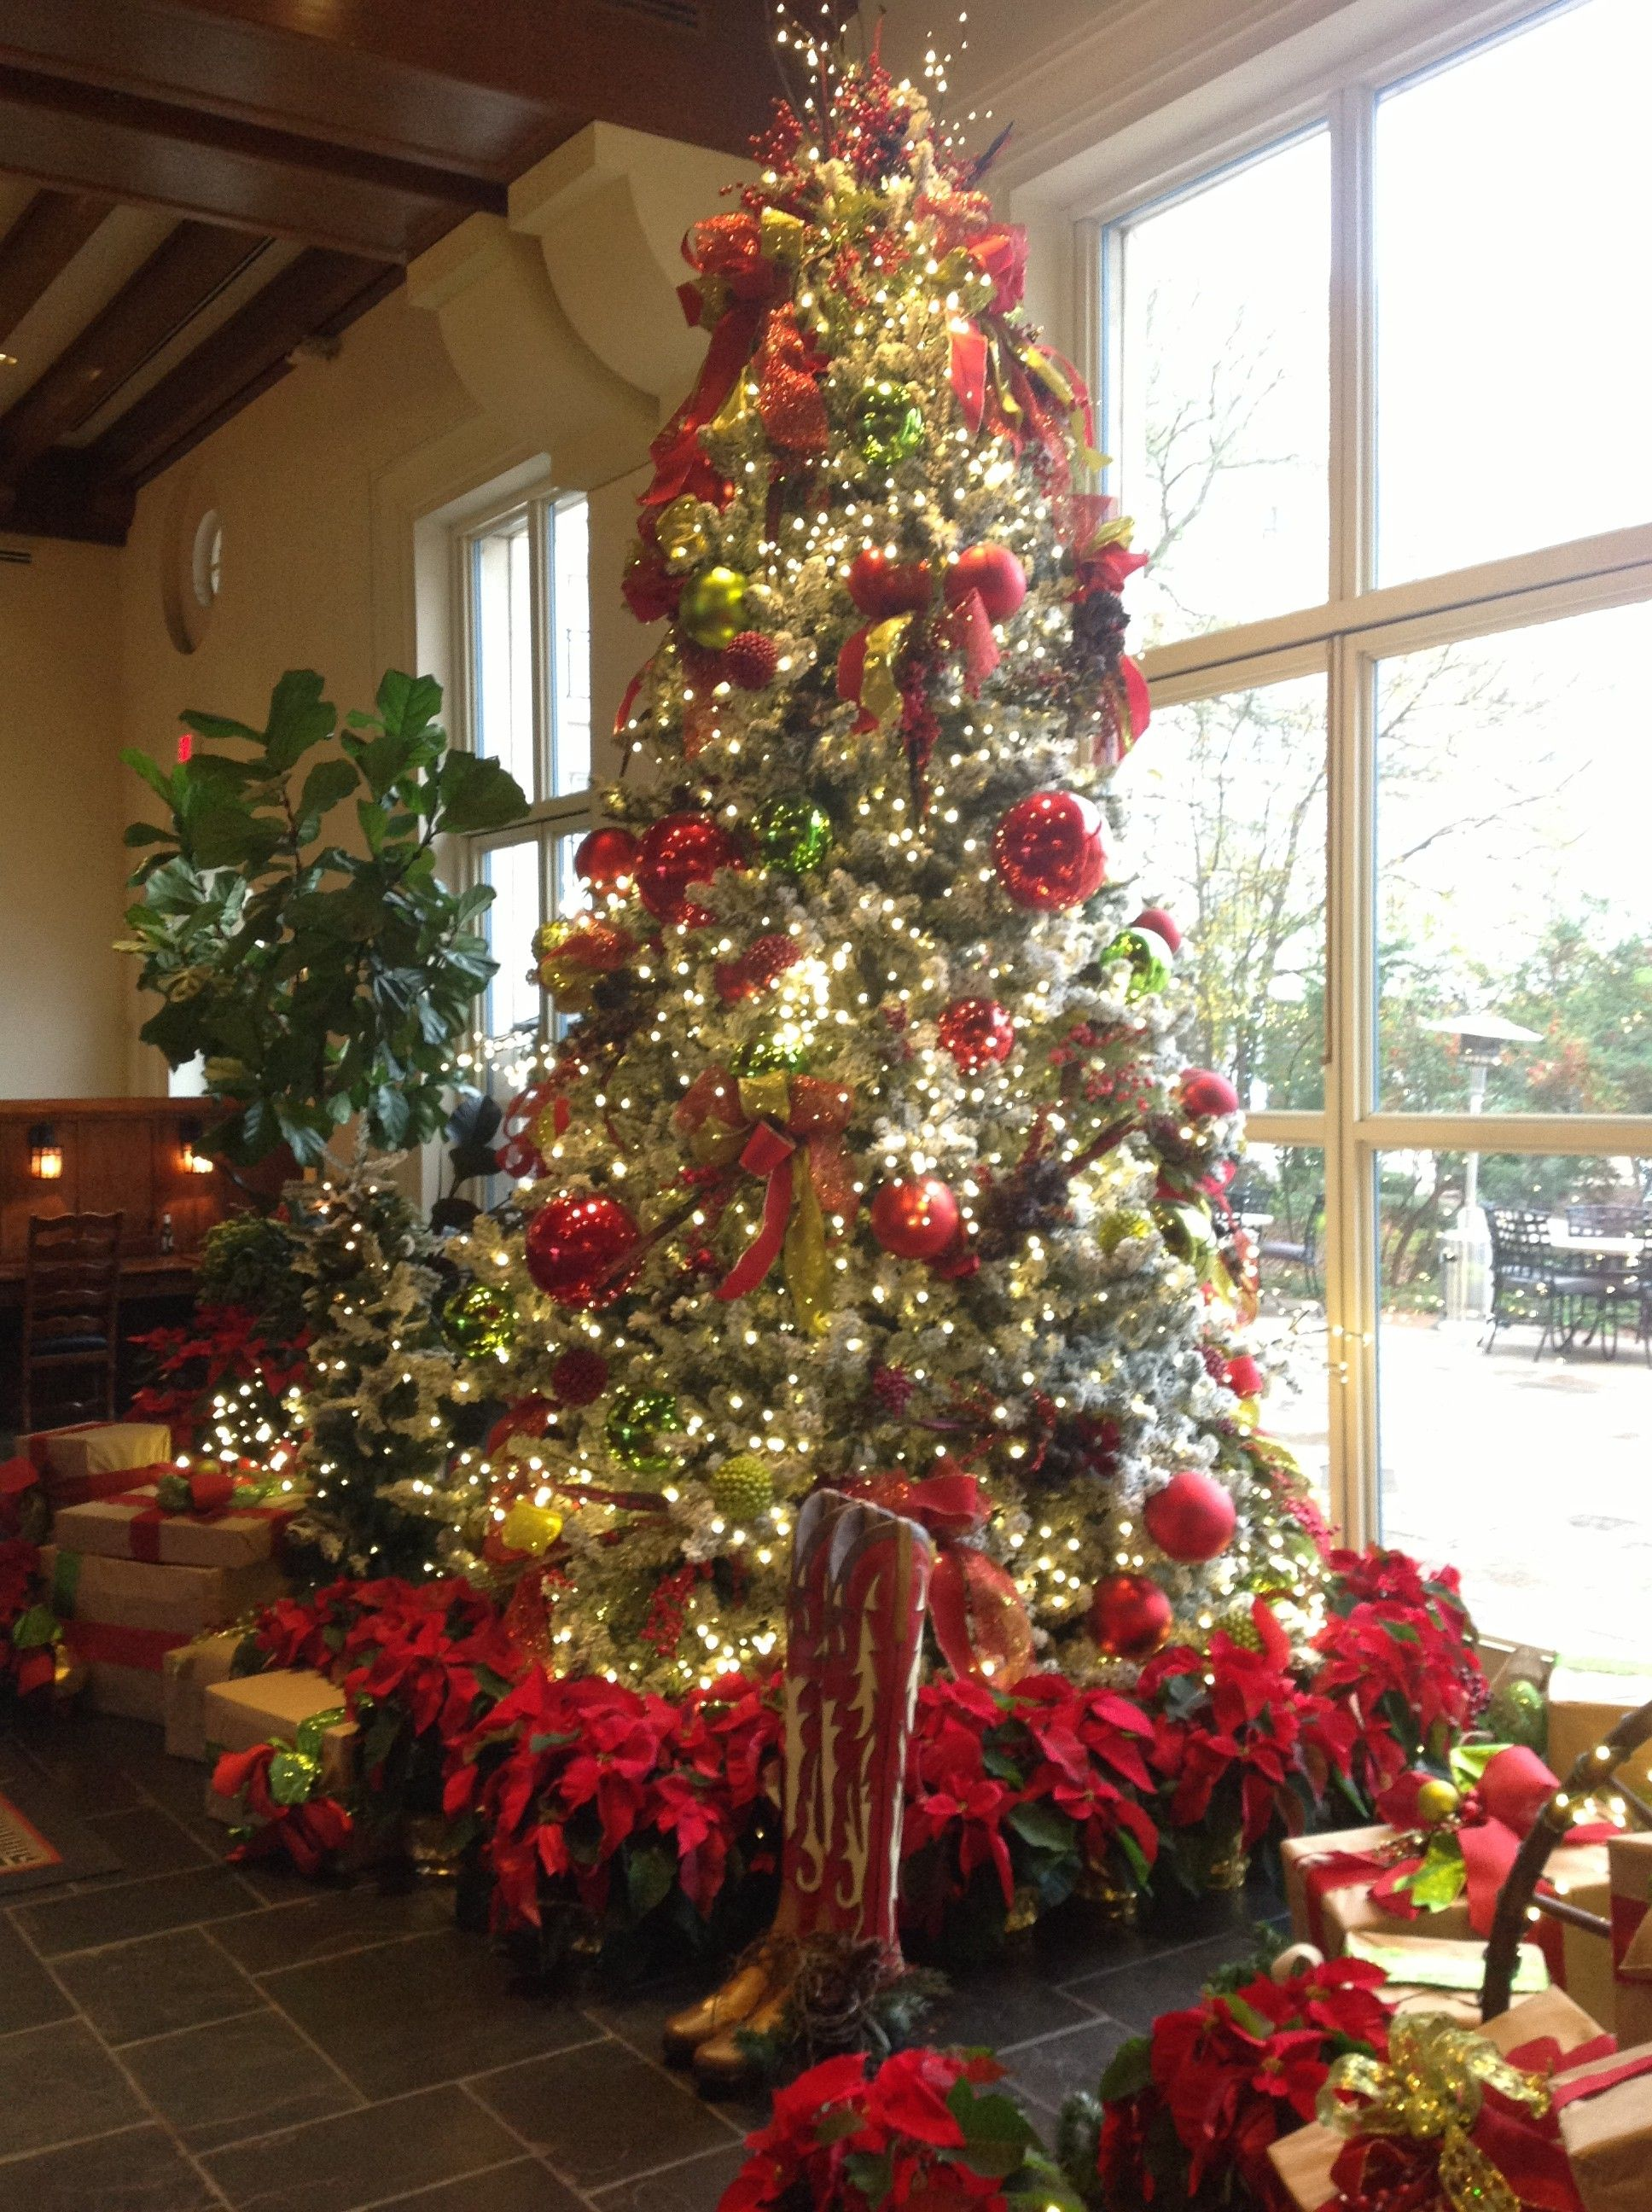 Eric Highland - 3/9 - The Austinot   Country christmas trees, Holiday christmas tree, Holiday